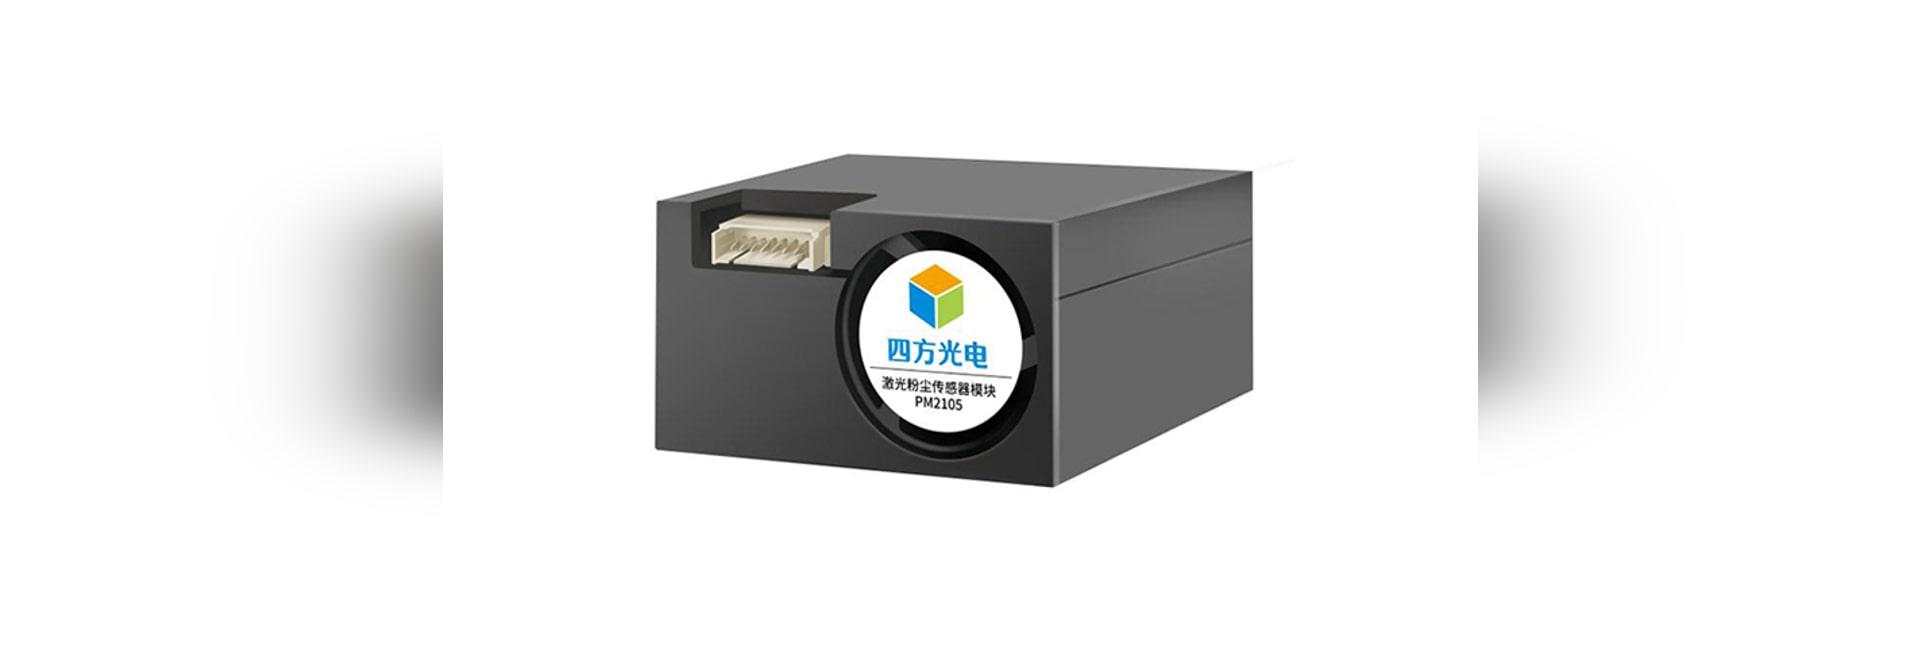 New Release Laser Particle Sensor PM2105